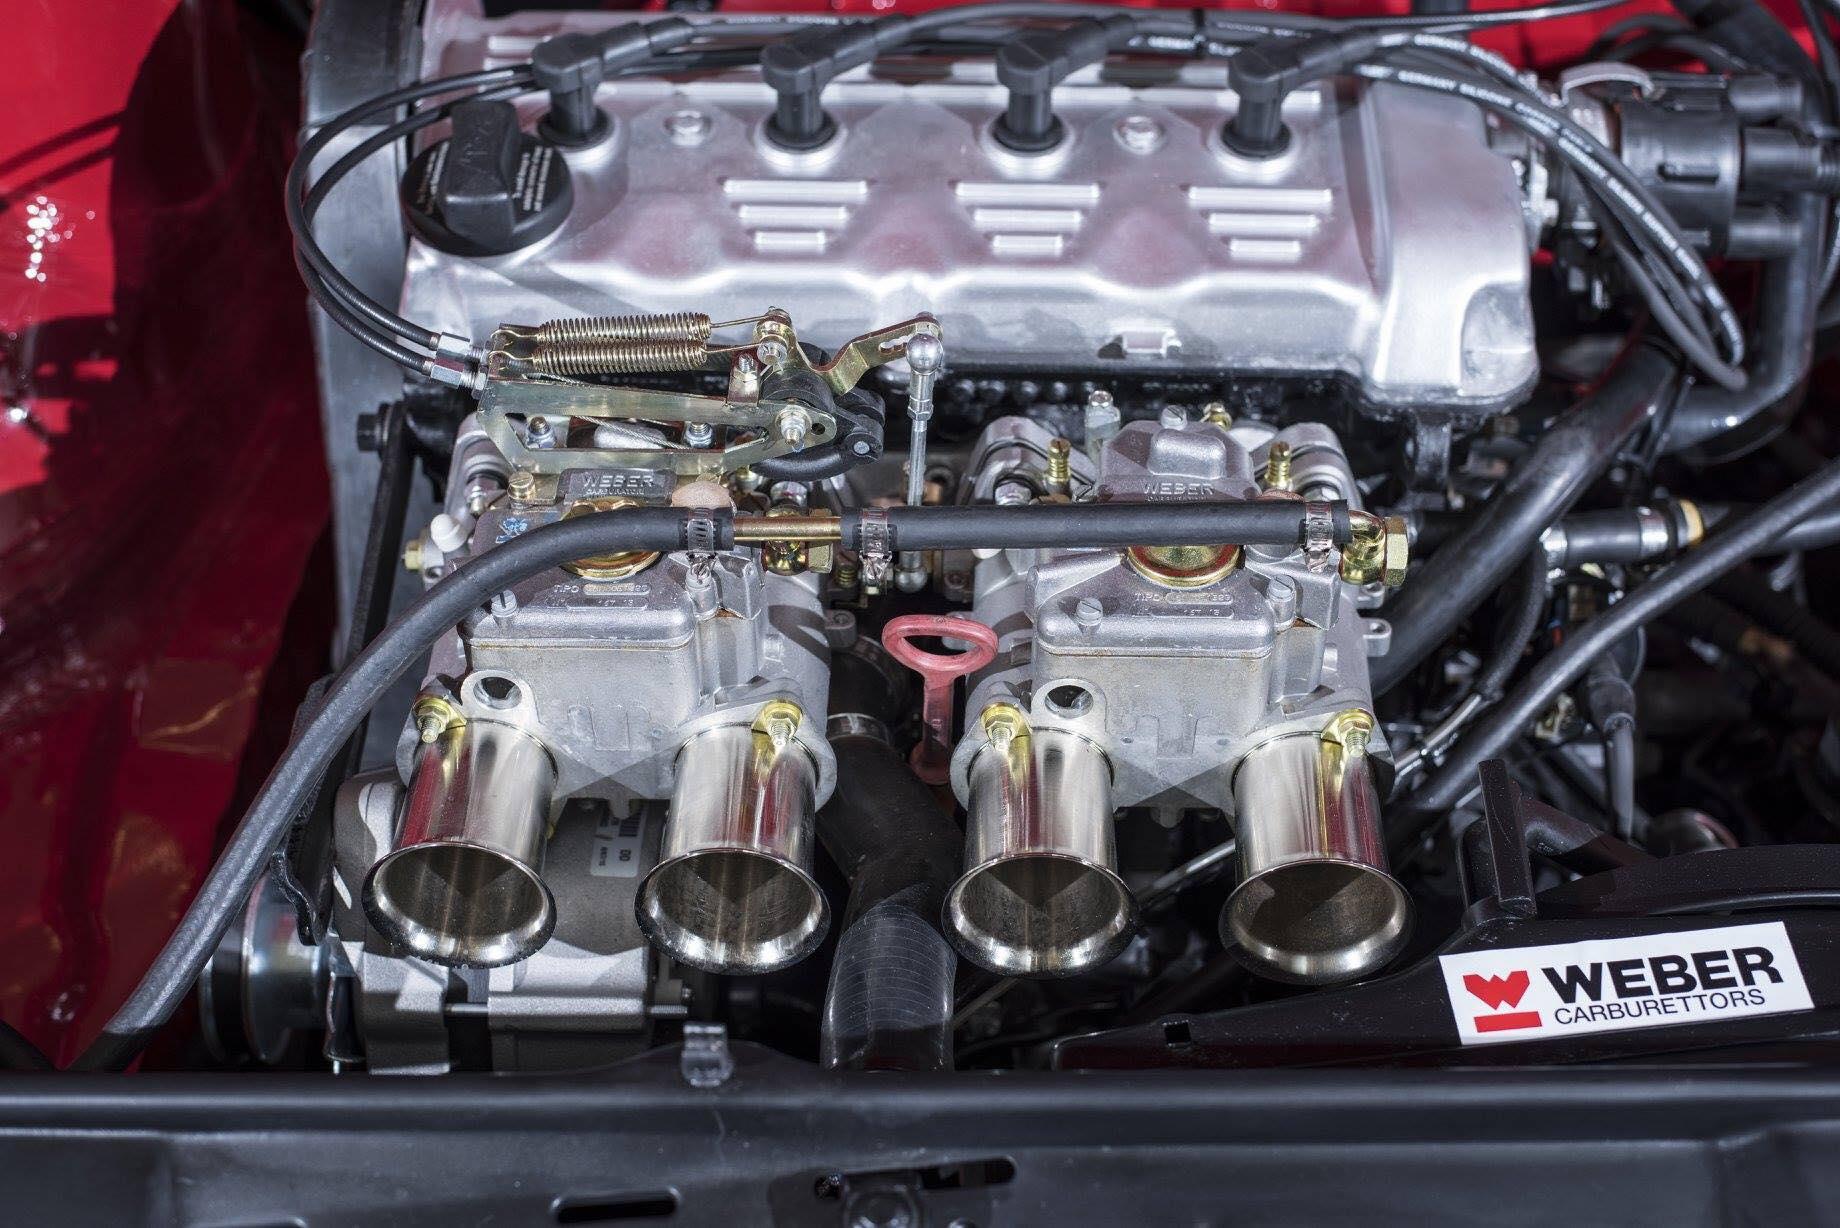 Touareg Facelift Conversion >> British Garage Converts Volkswagen Golf 2 GTI To Very Short Wheelbase Cabrio - autoevolution